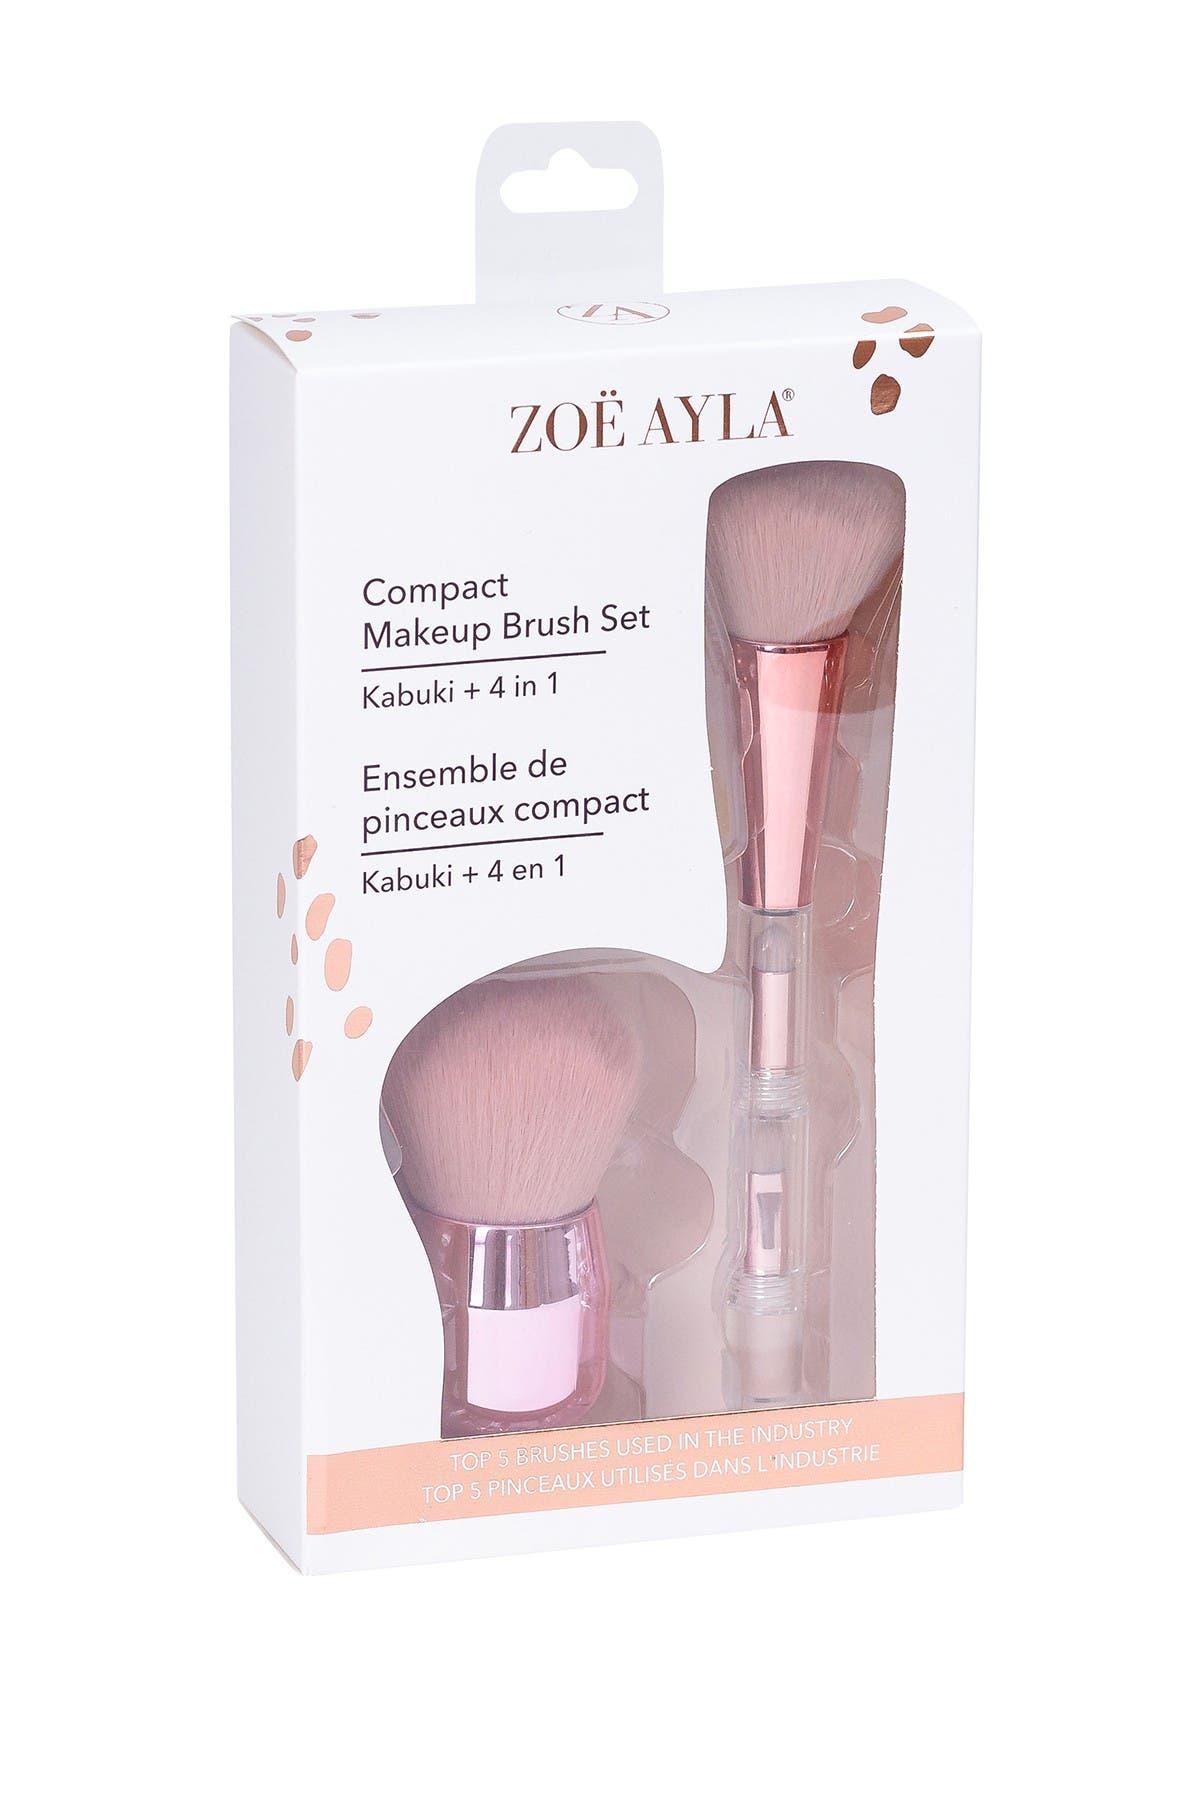 Zoe Ayla 2 Makeup Brushes: 1 Kabuki + 4in1 Brush